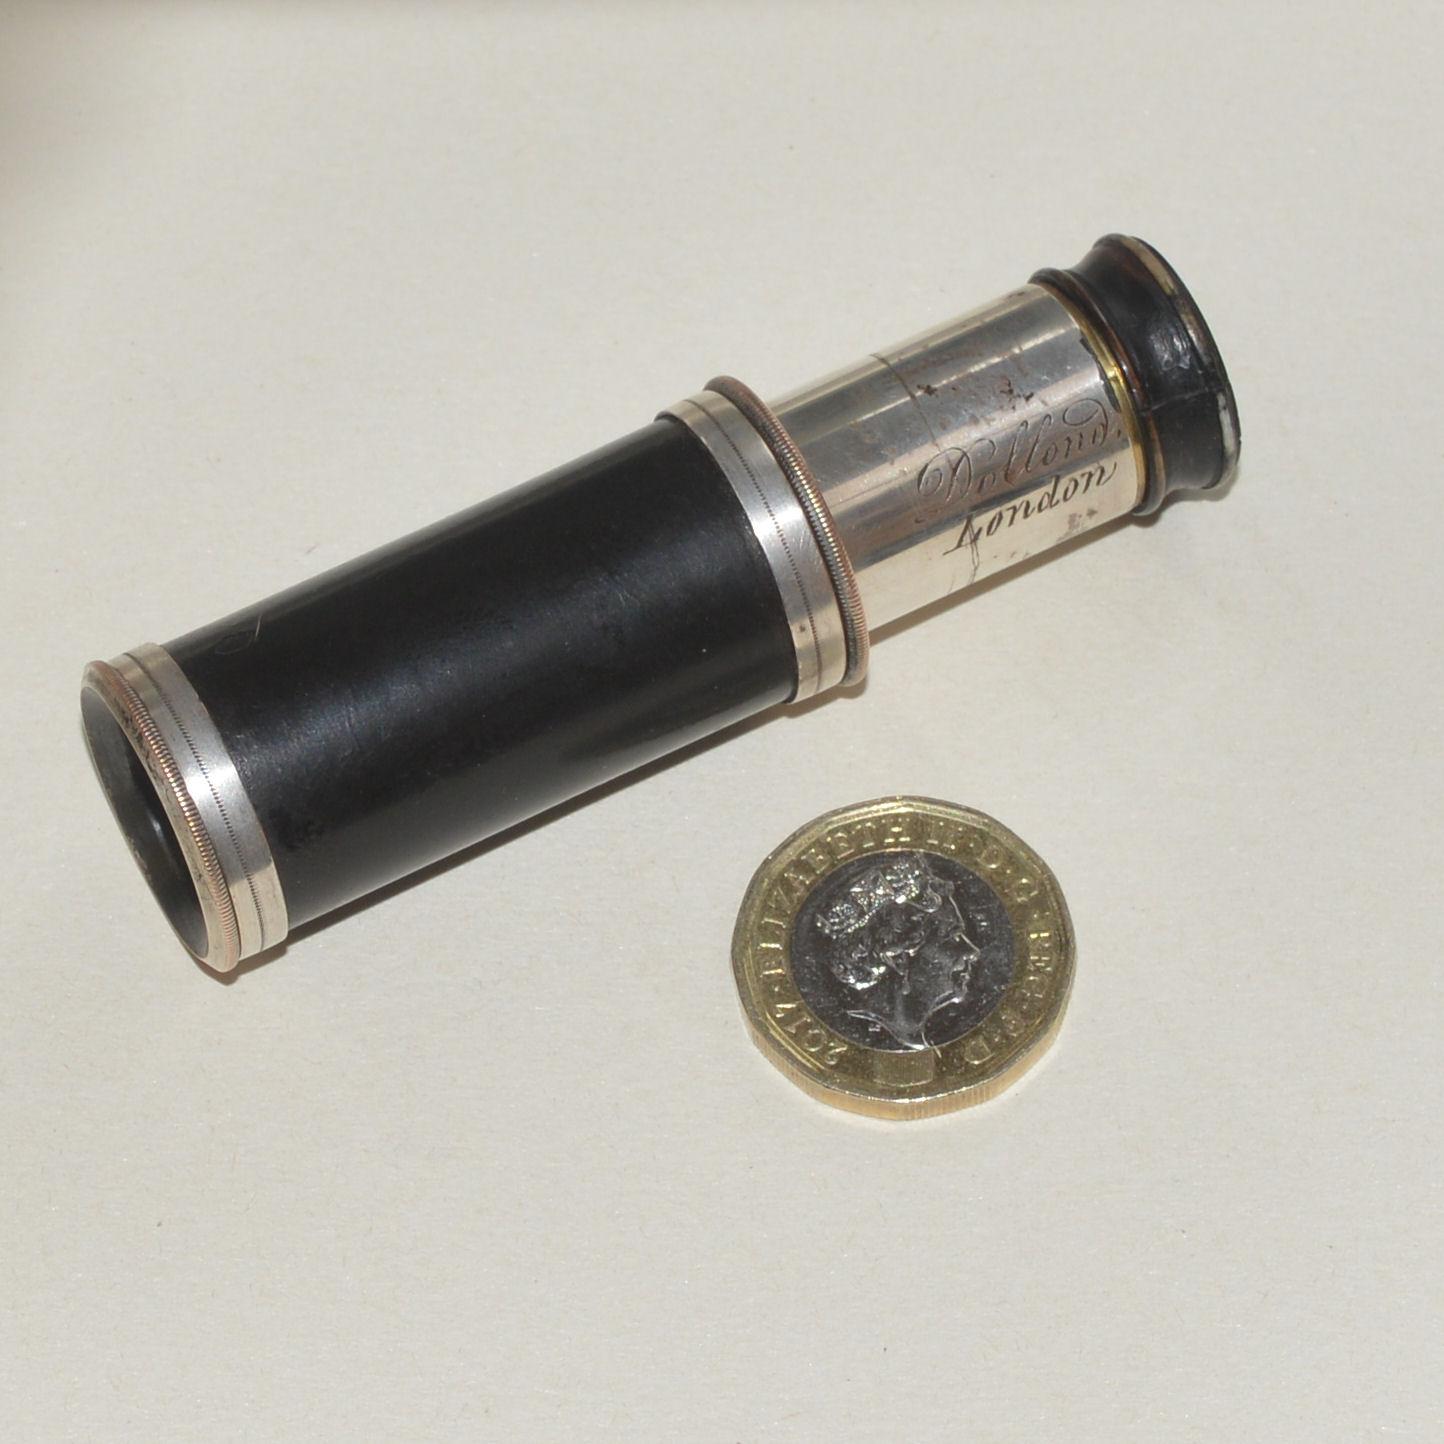 rare miniature silver plated telescope / spyglass – Dollond, London.